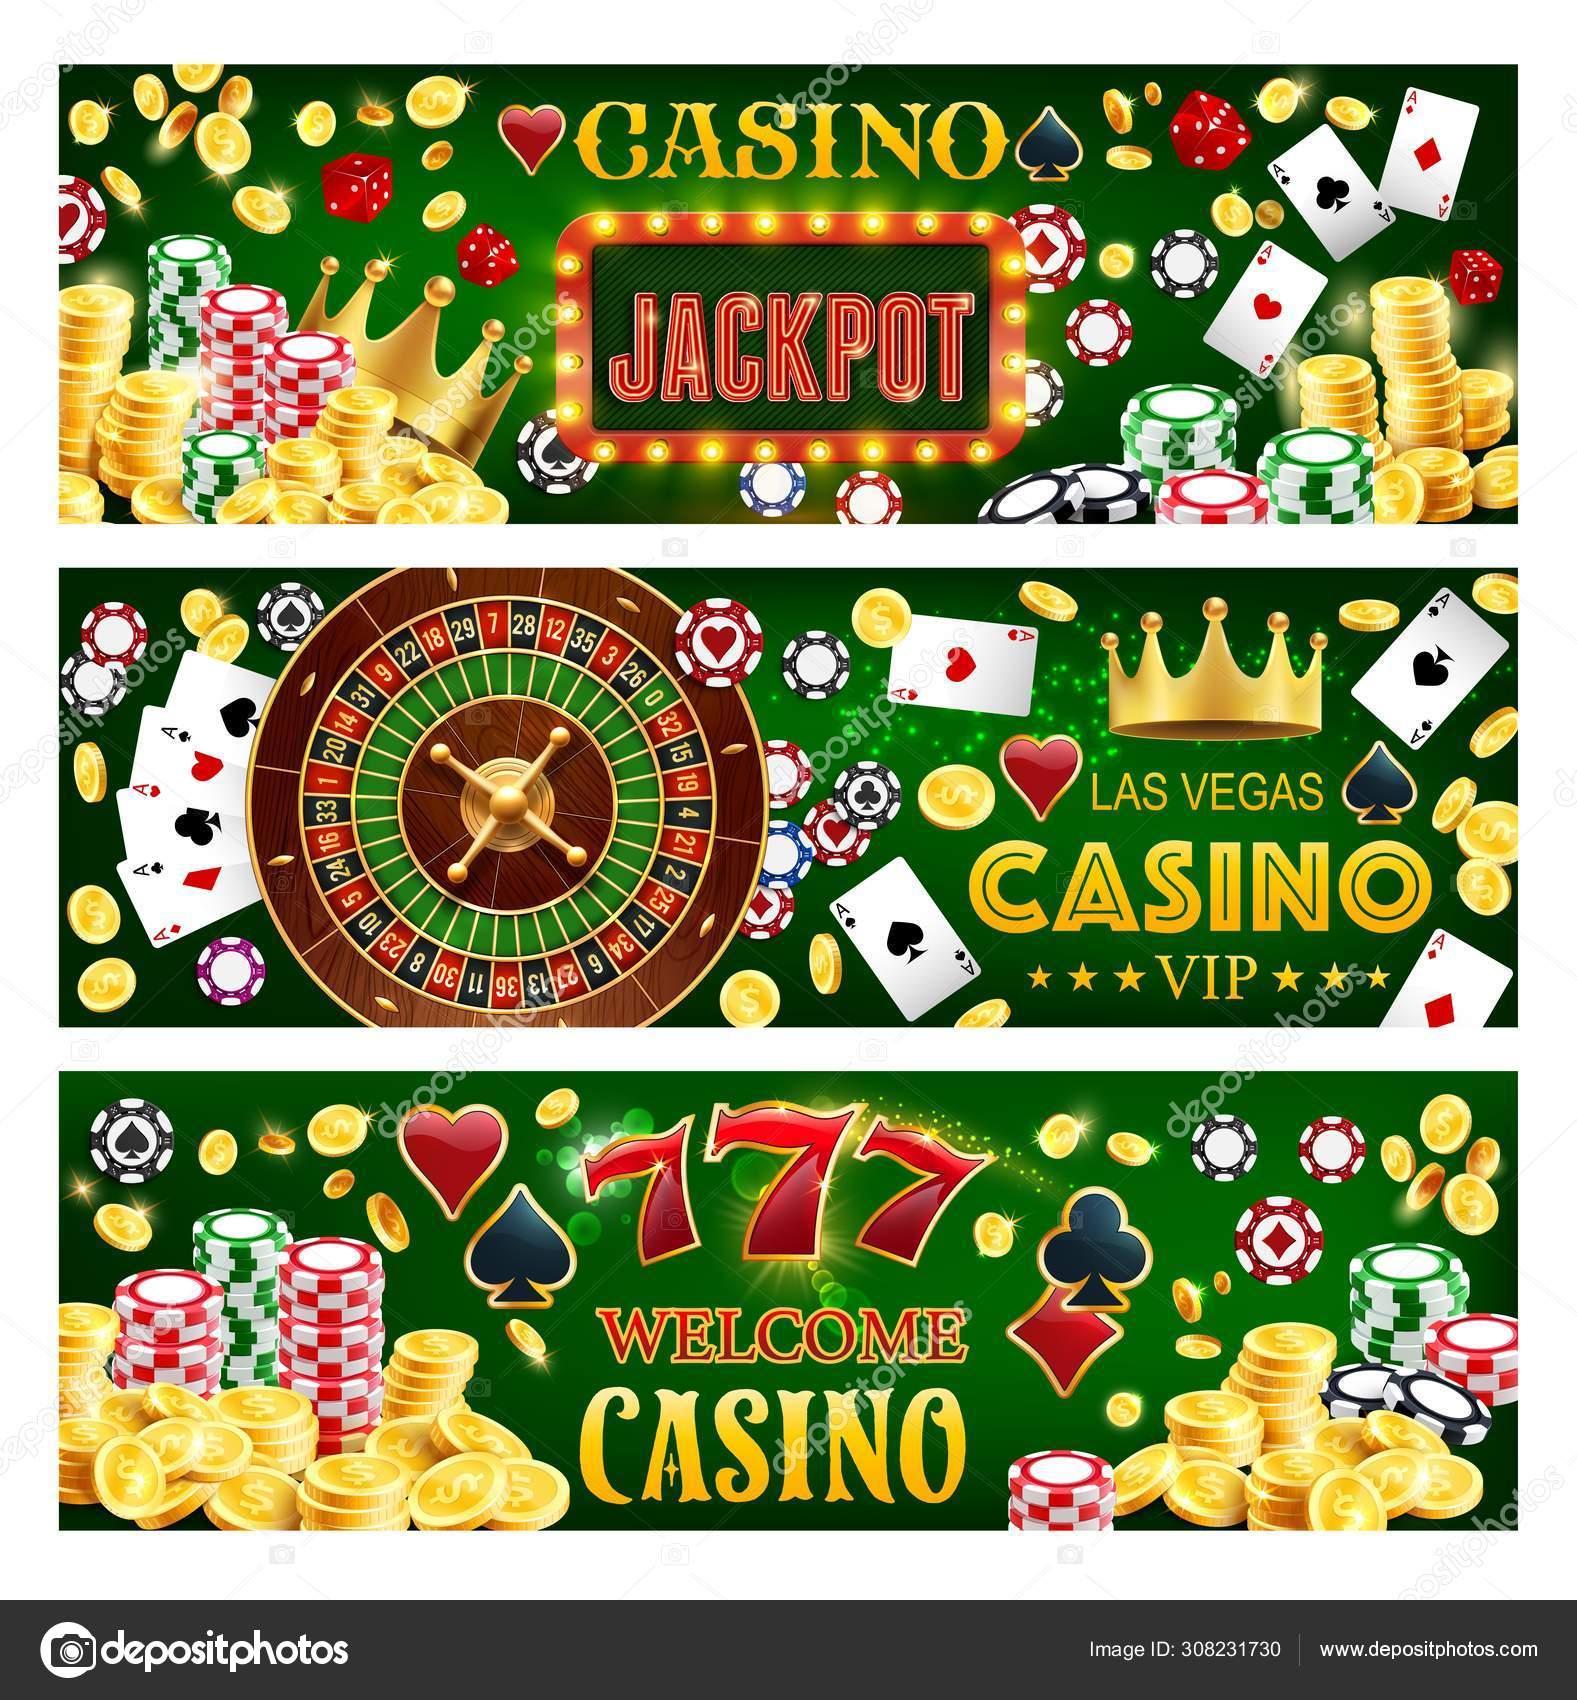 Casino poker big win, wheel of fortune, jackpot - Stock